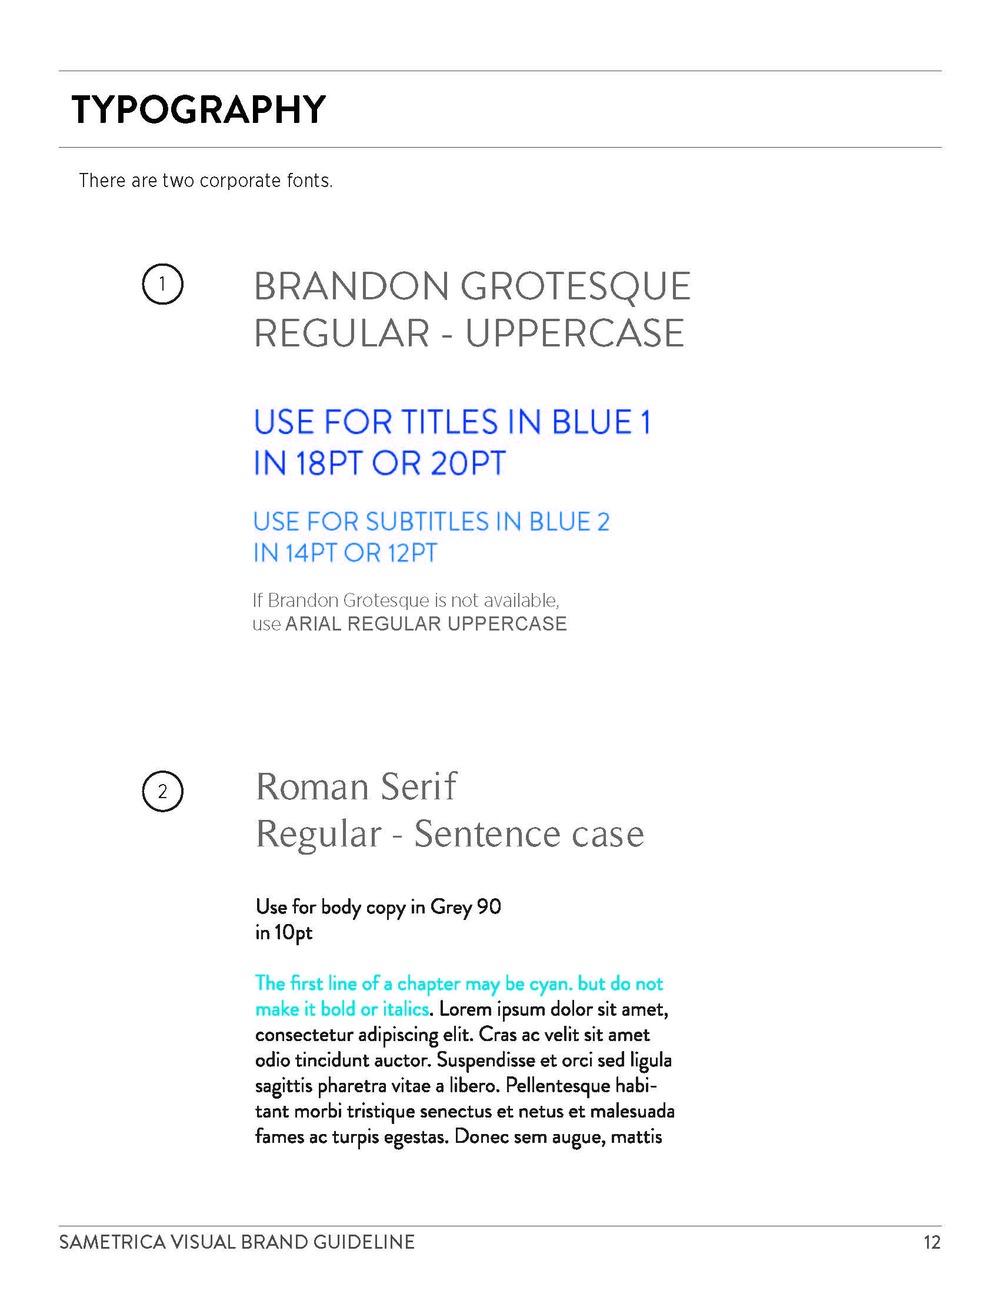 150911_SAMETRICA Brand Guideline_Page_12.jpg